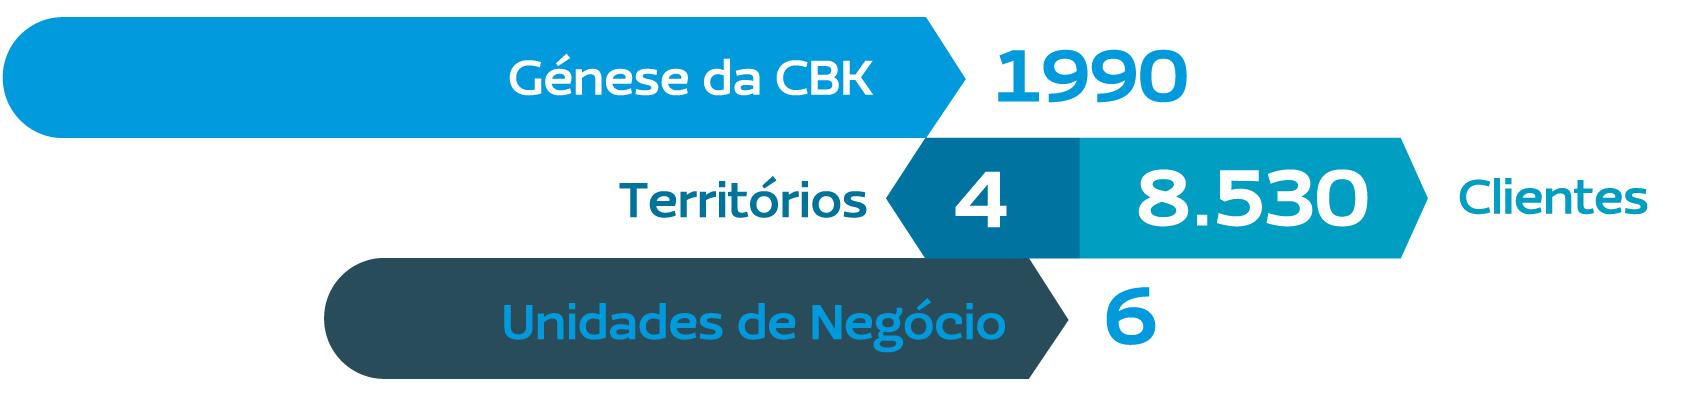 CBK Key facts